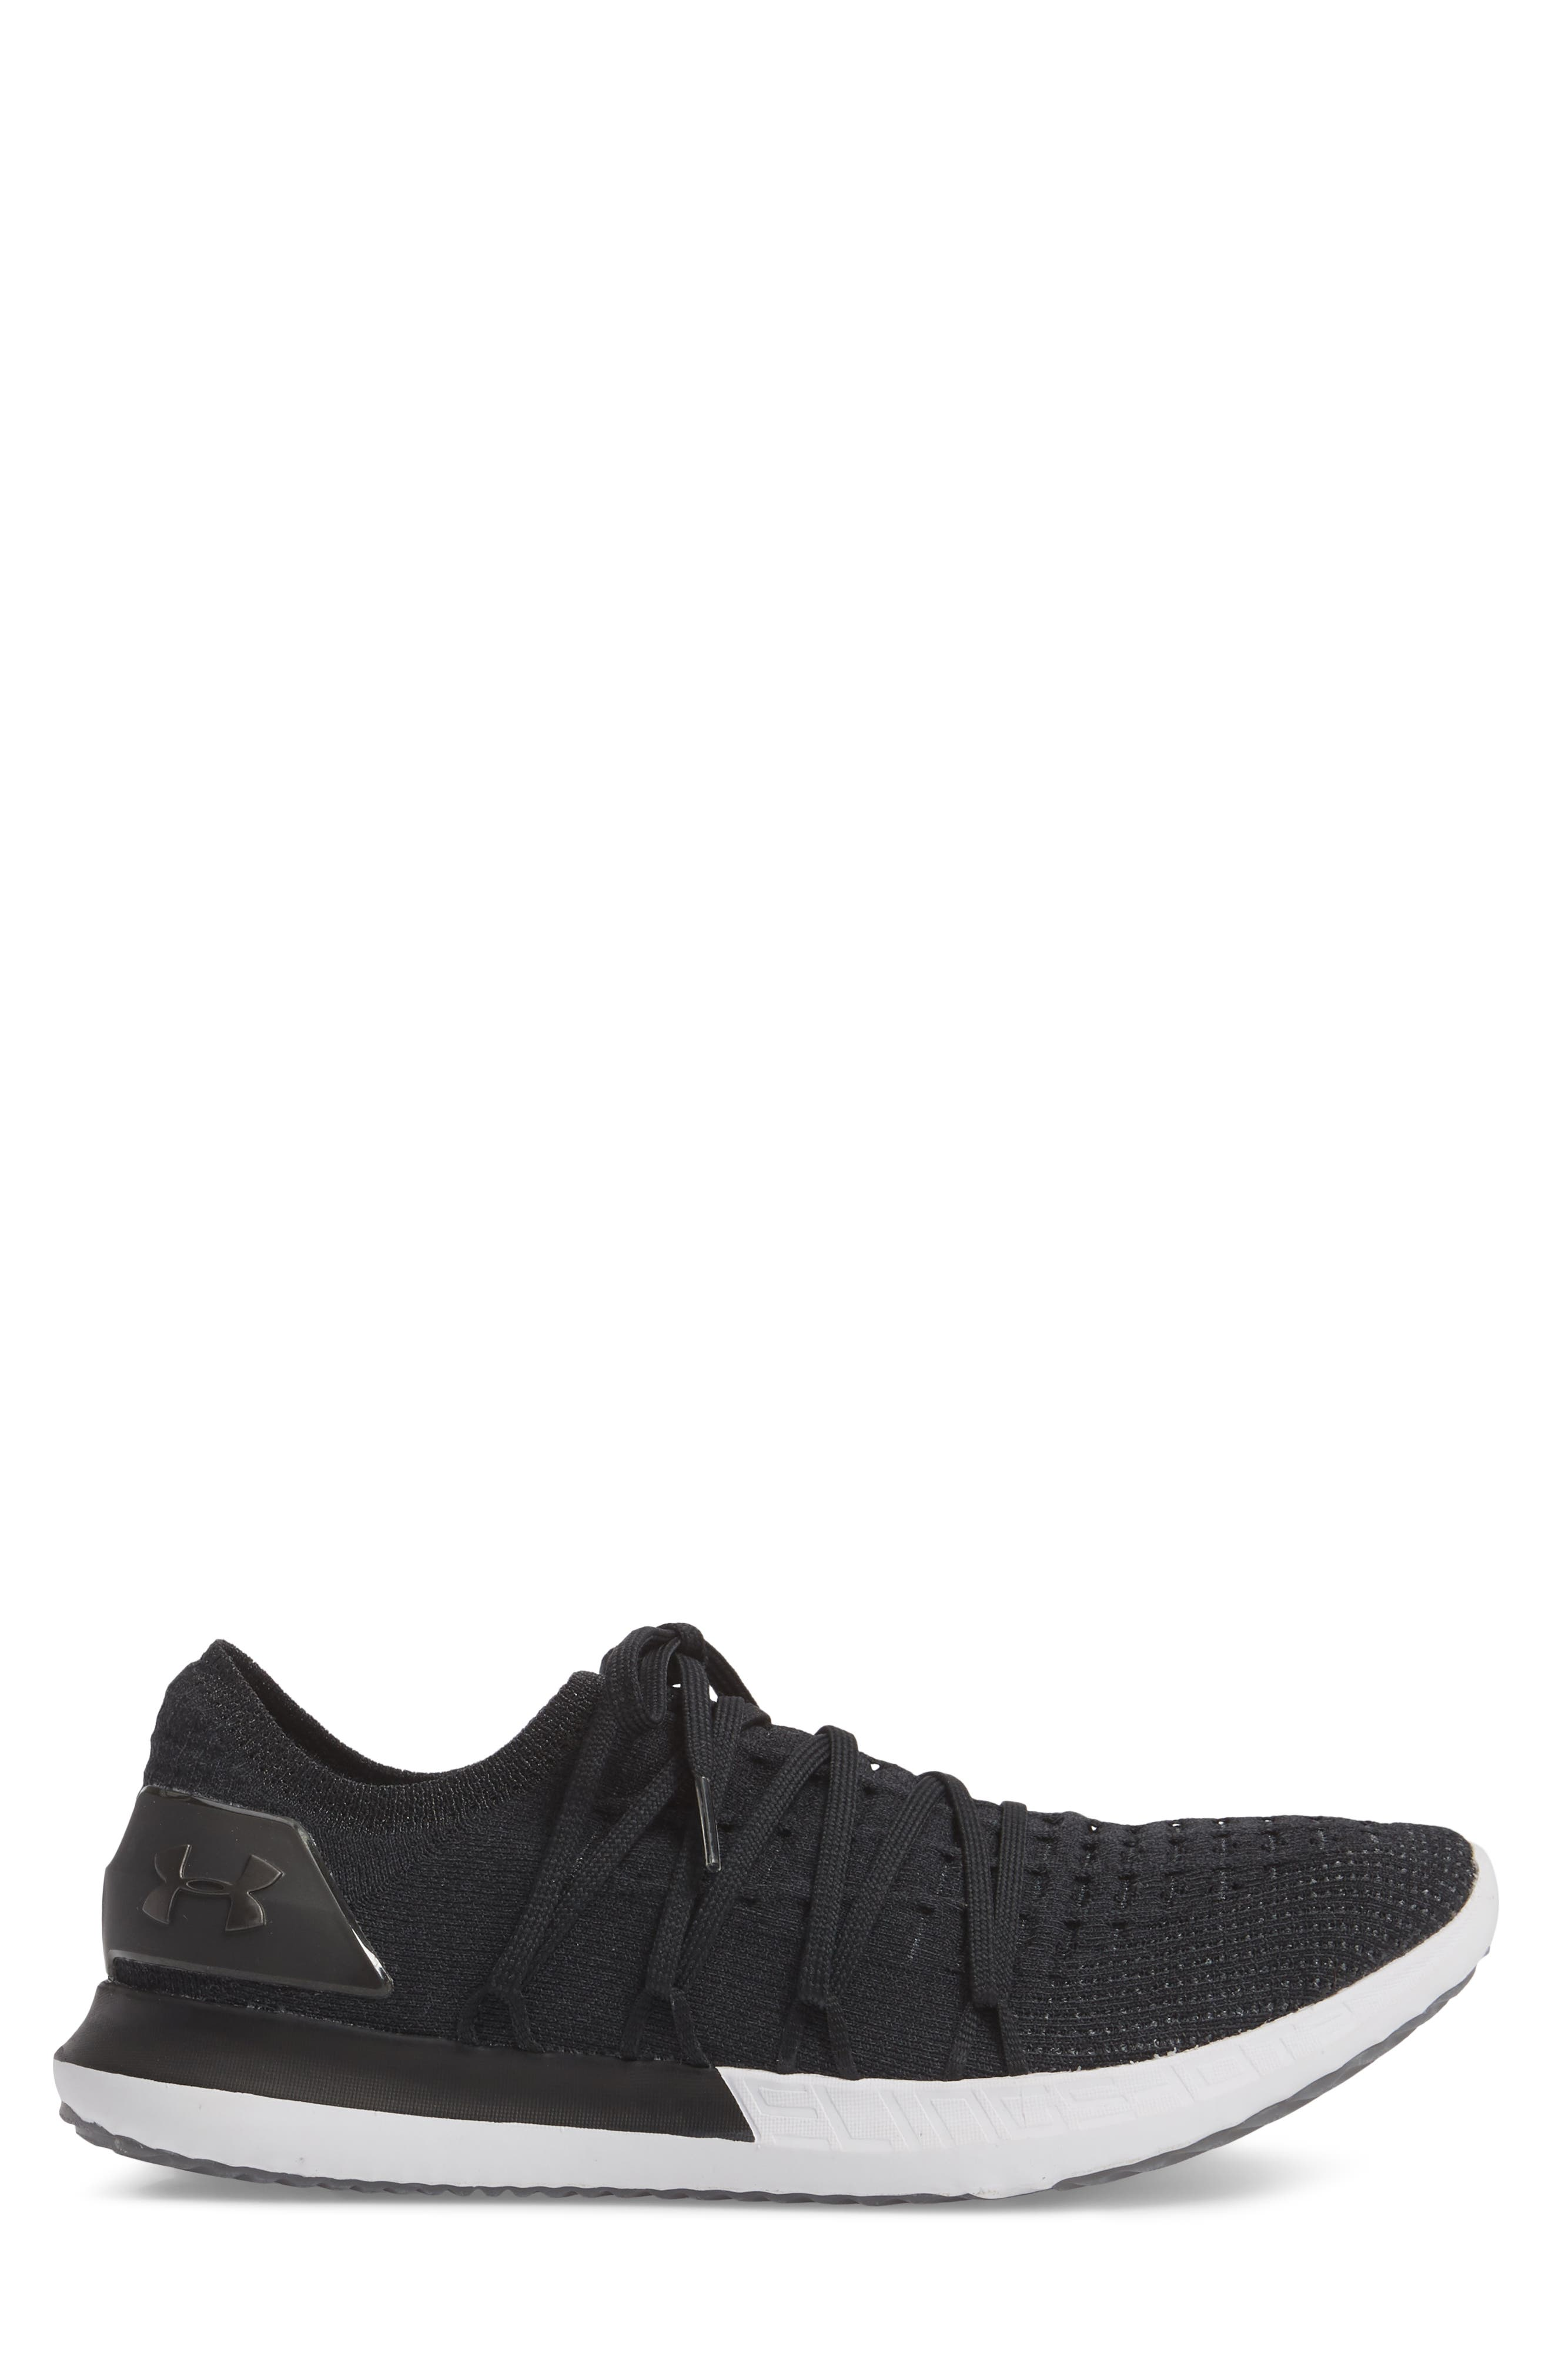 Speedform<sup>®</sup> Slingshot 2 Sneaker,                             Alternate thumbnail 3, color,                             BLACK / ANTHRACITE / METALLIC